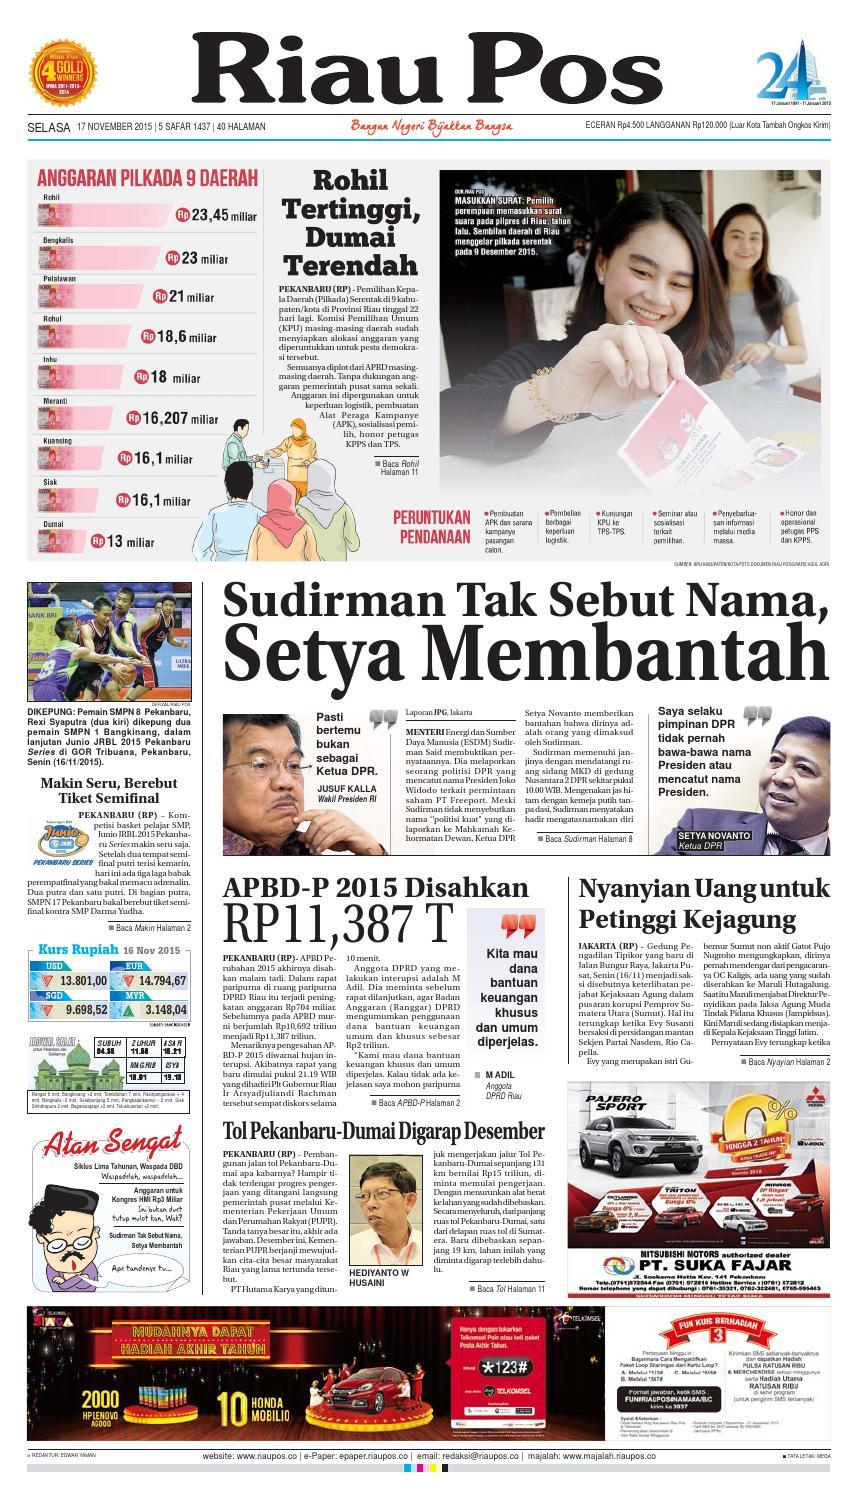 Riau Pos By Issuu Produk Ukm Bumn Tenun Pagatan Kemeja Pria Biru Kapal